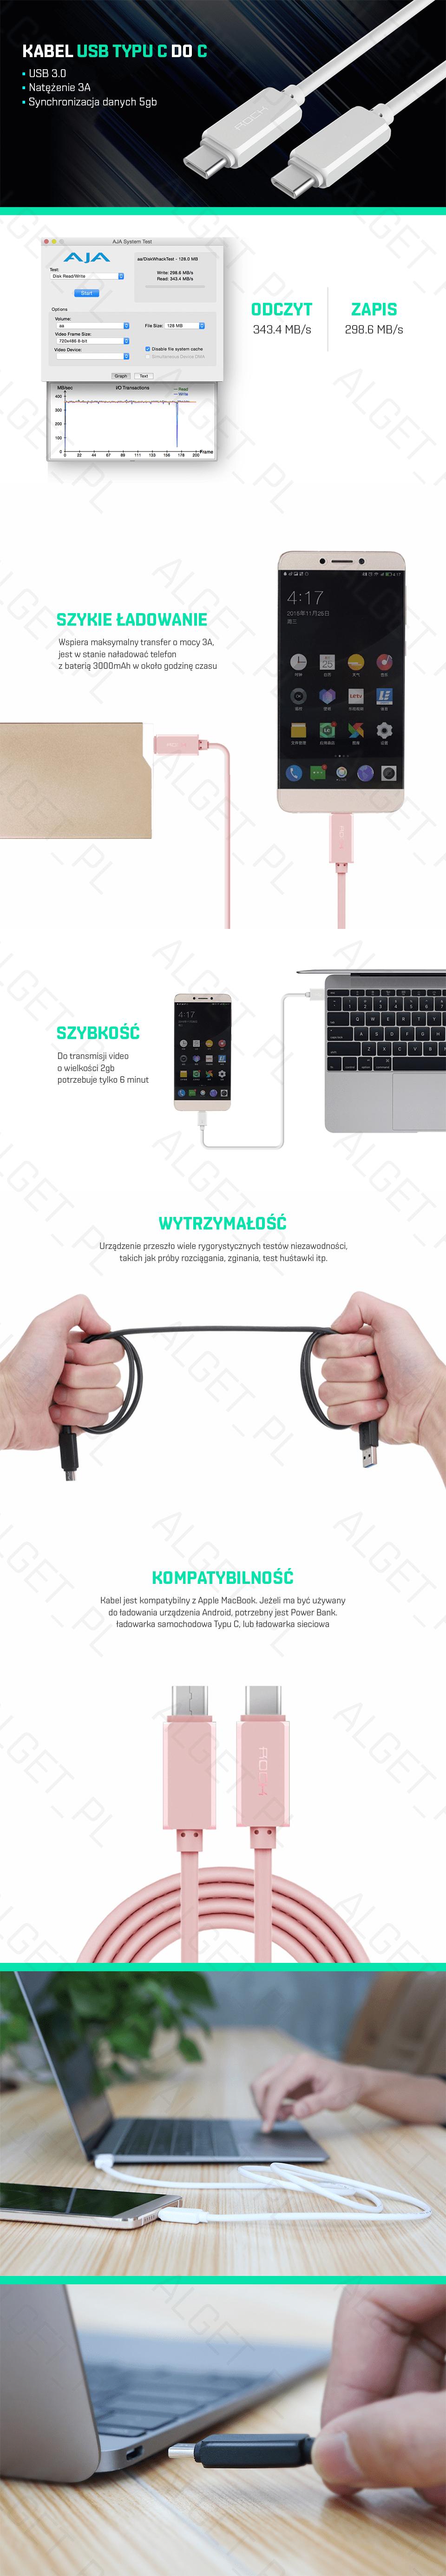 Kabel USB-C ROCK Ładowarka NOKIA MACBOOK HUAWEI 3A